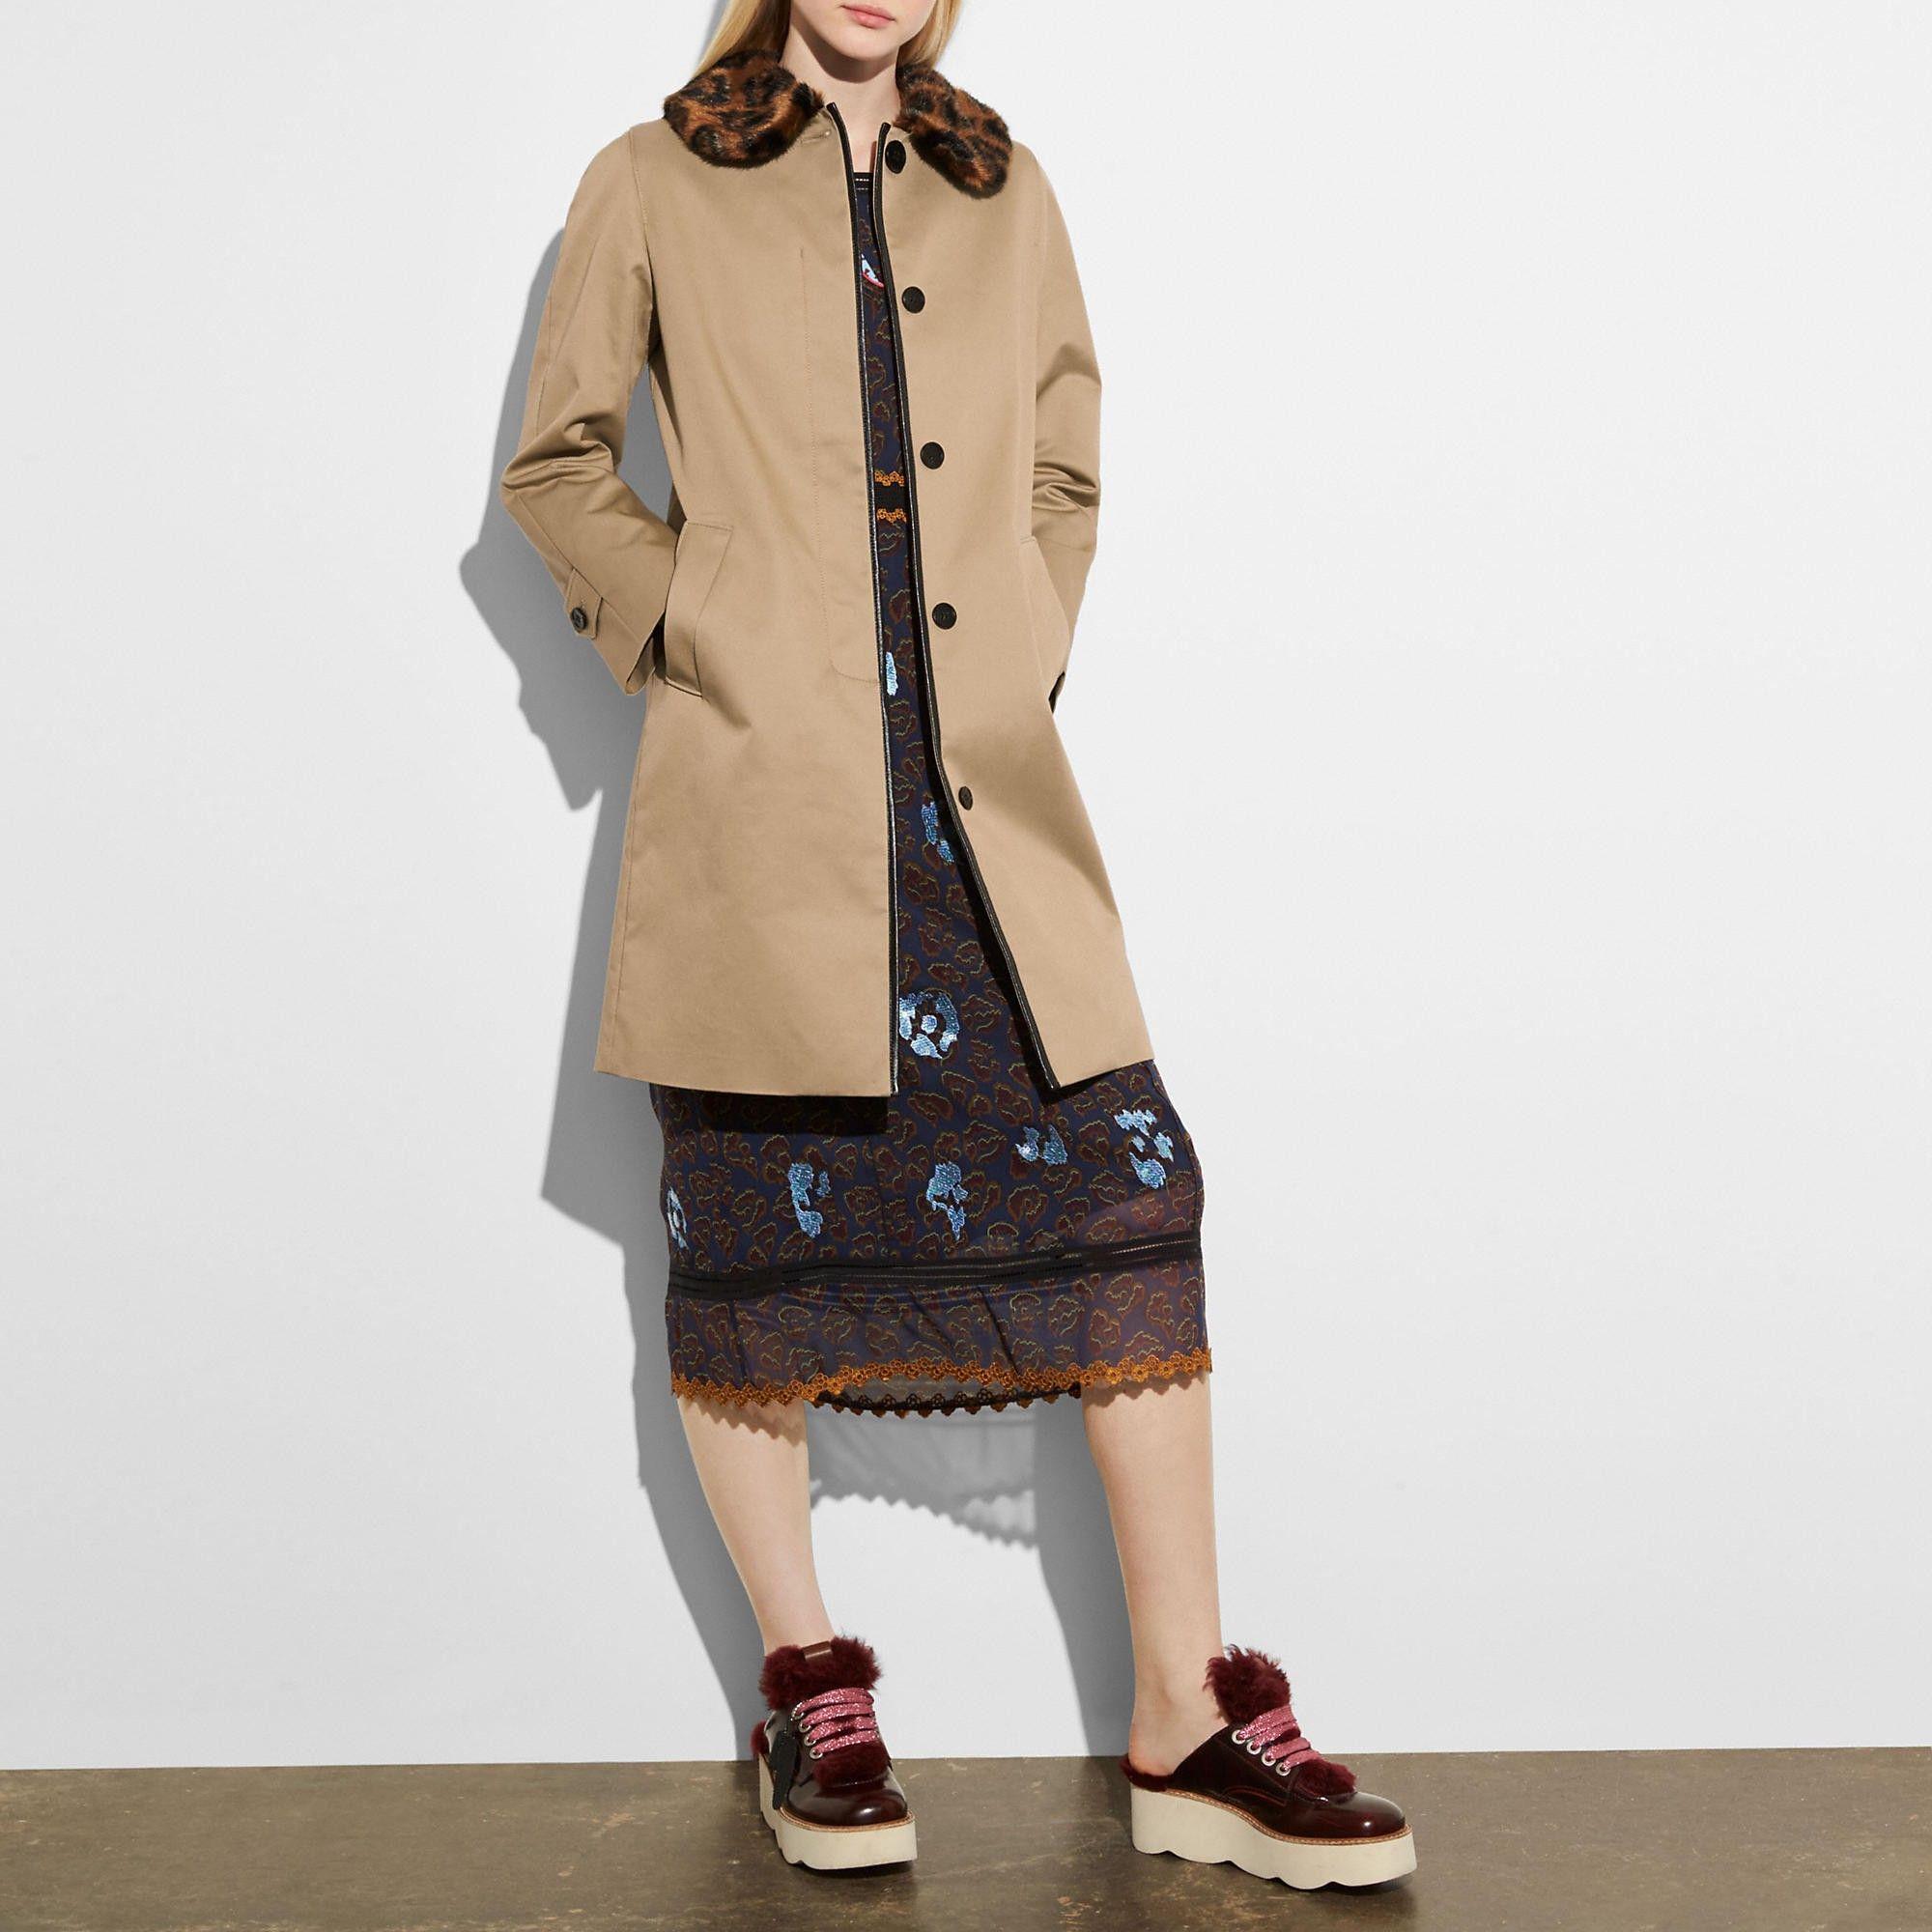 COACH leather trim coat. coach cloth Coats for women